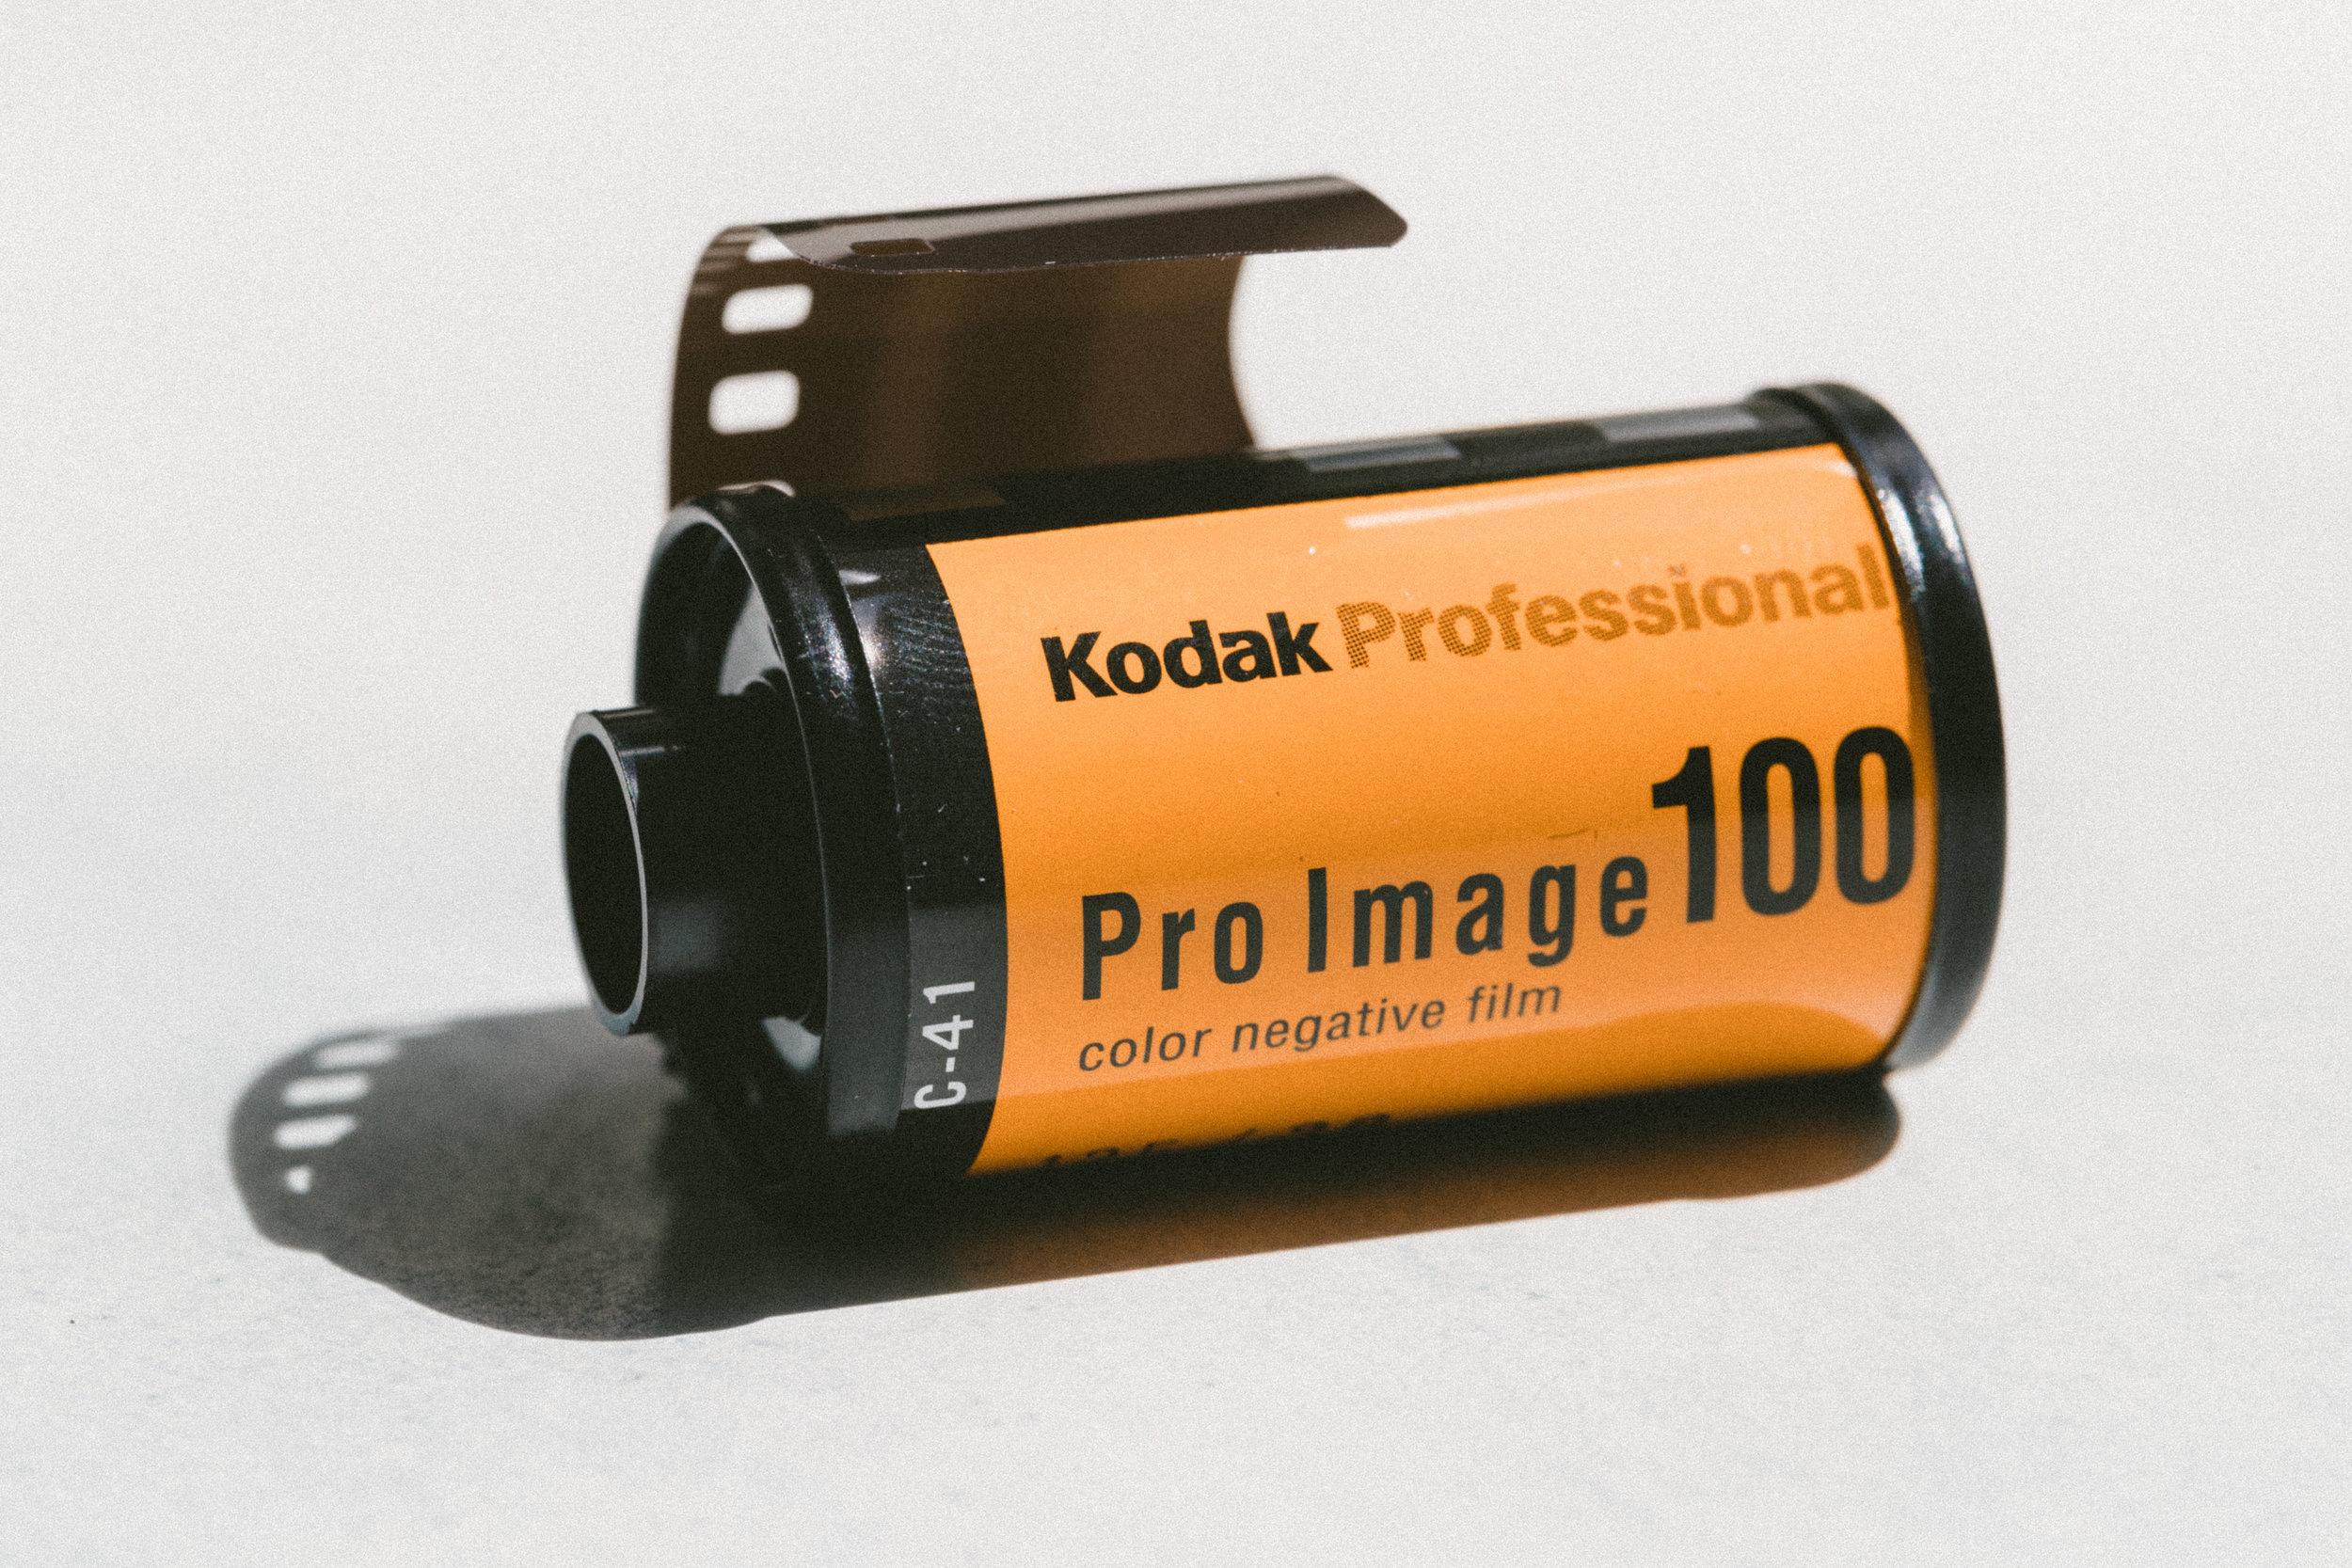 Kodak Horizon Scanning fail example Inverroy